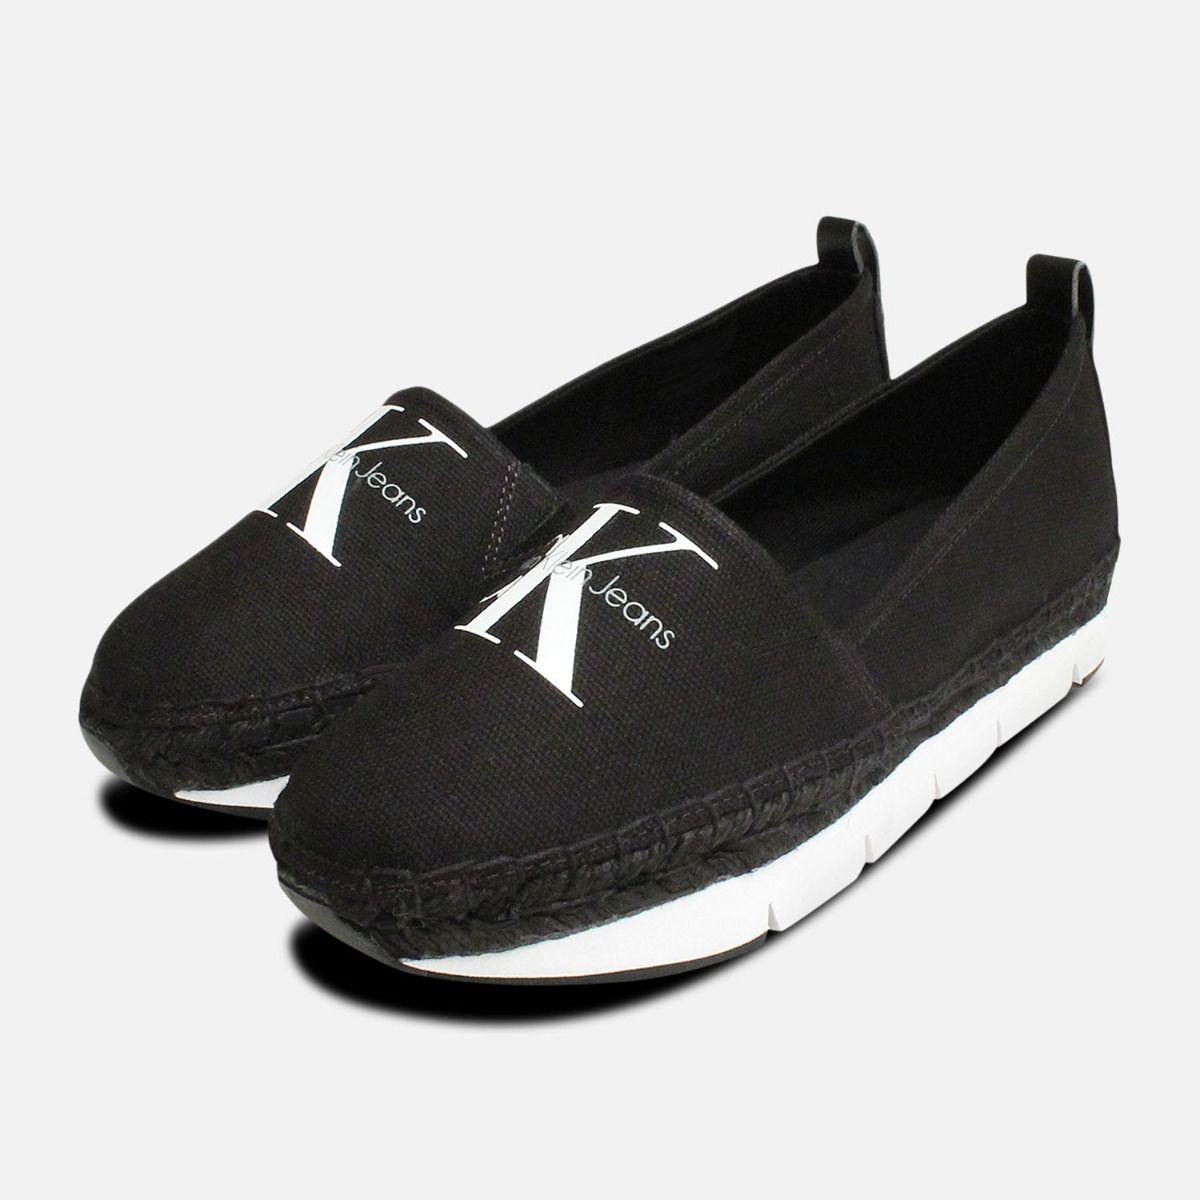 83c790ac20cc Calvin Klein Shoes Genna Canvas Espadrilles in Black